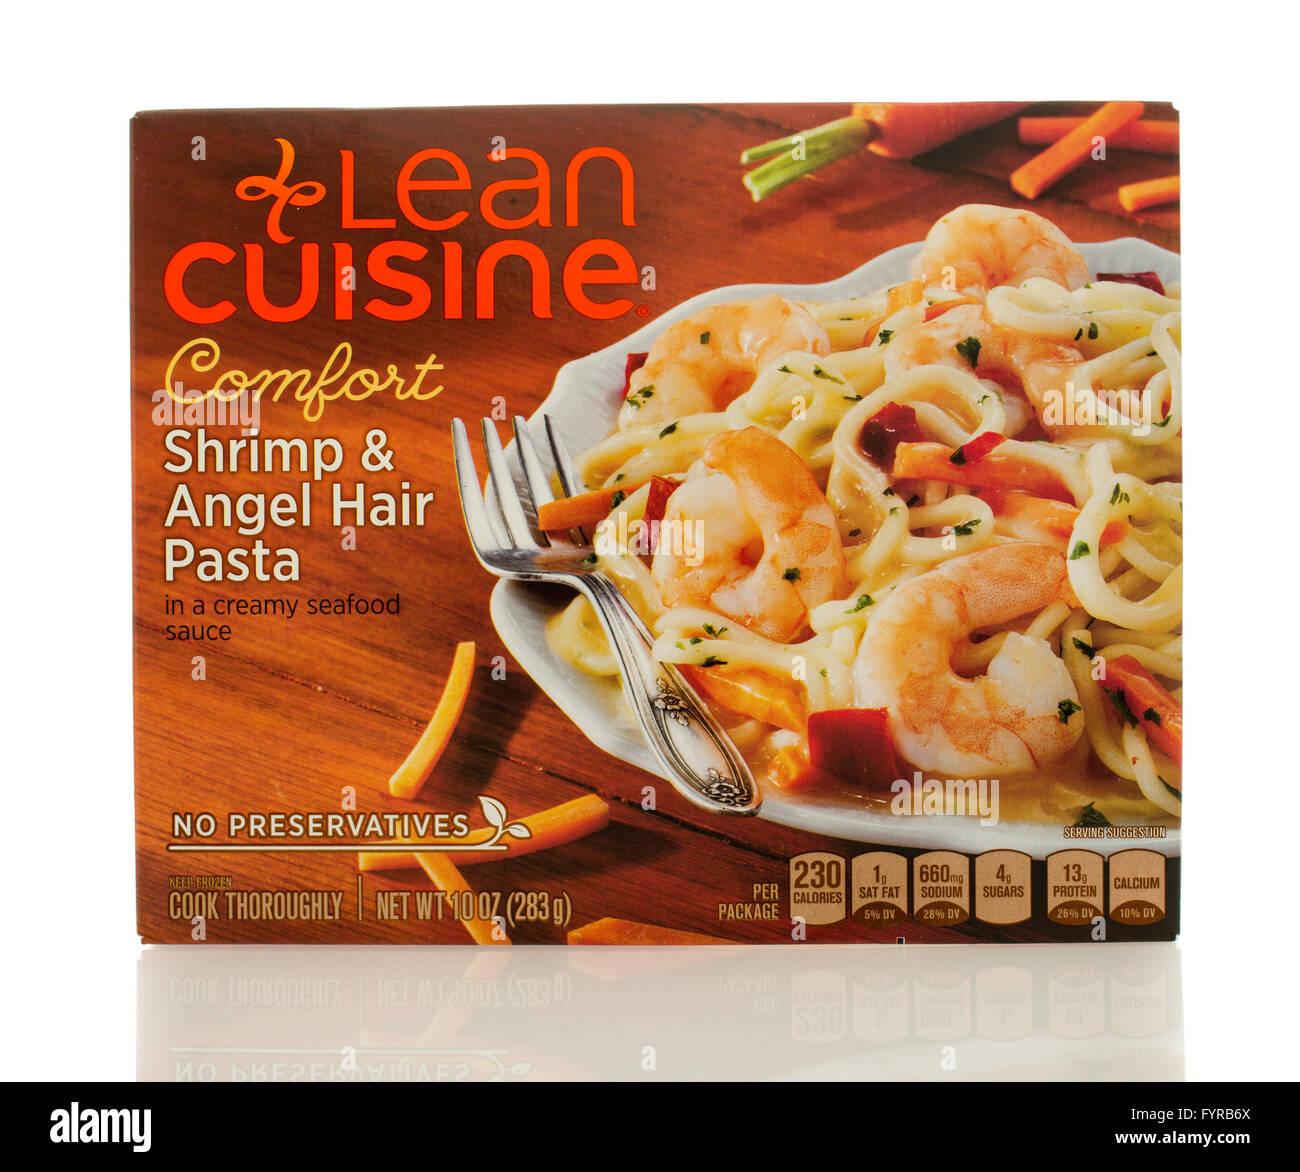 Winneconne Wi 2 March 2016 A Box Of Lean Cuisine Shrimp Angel